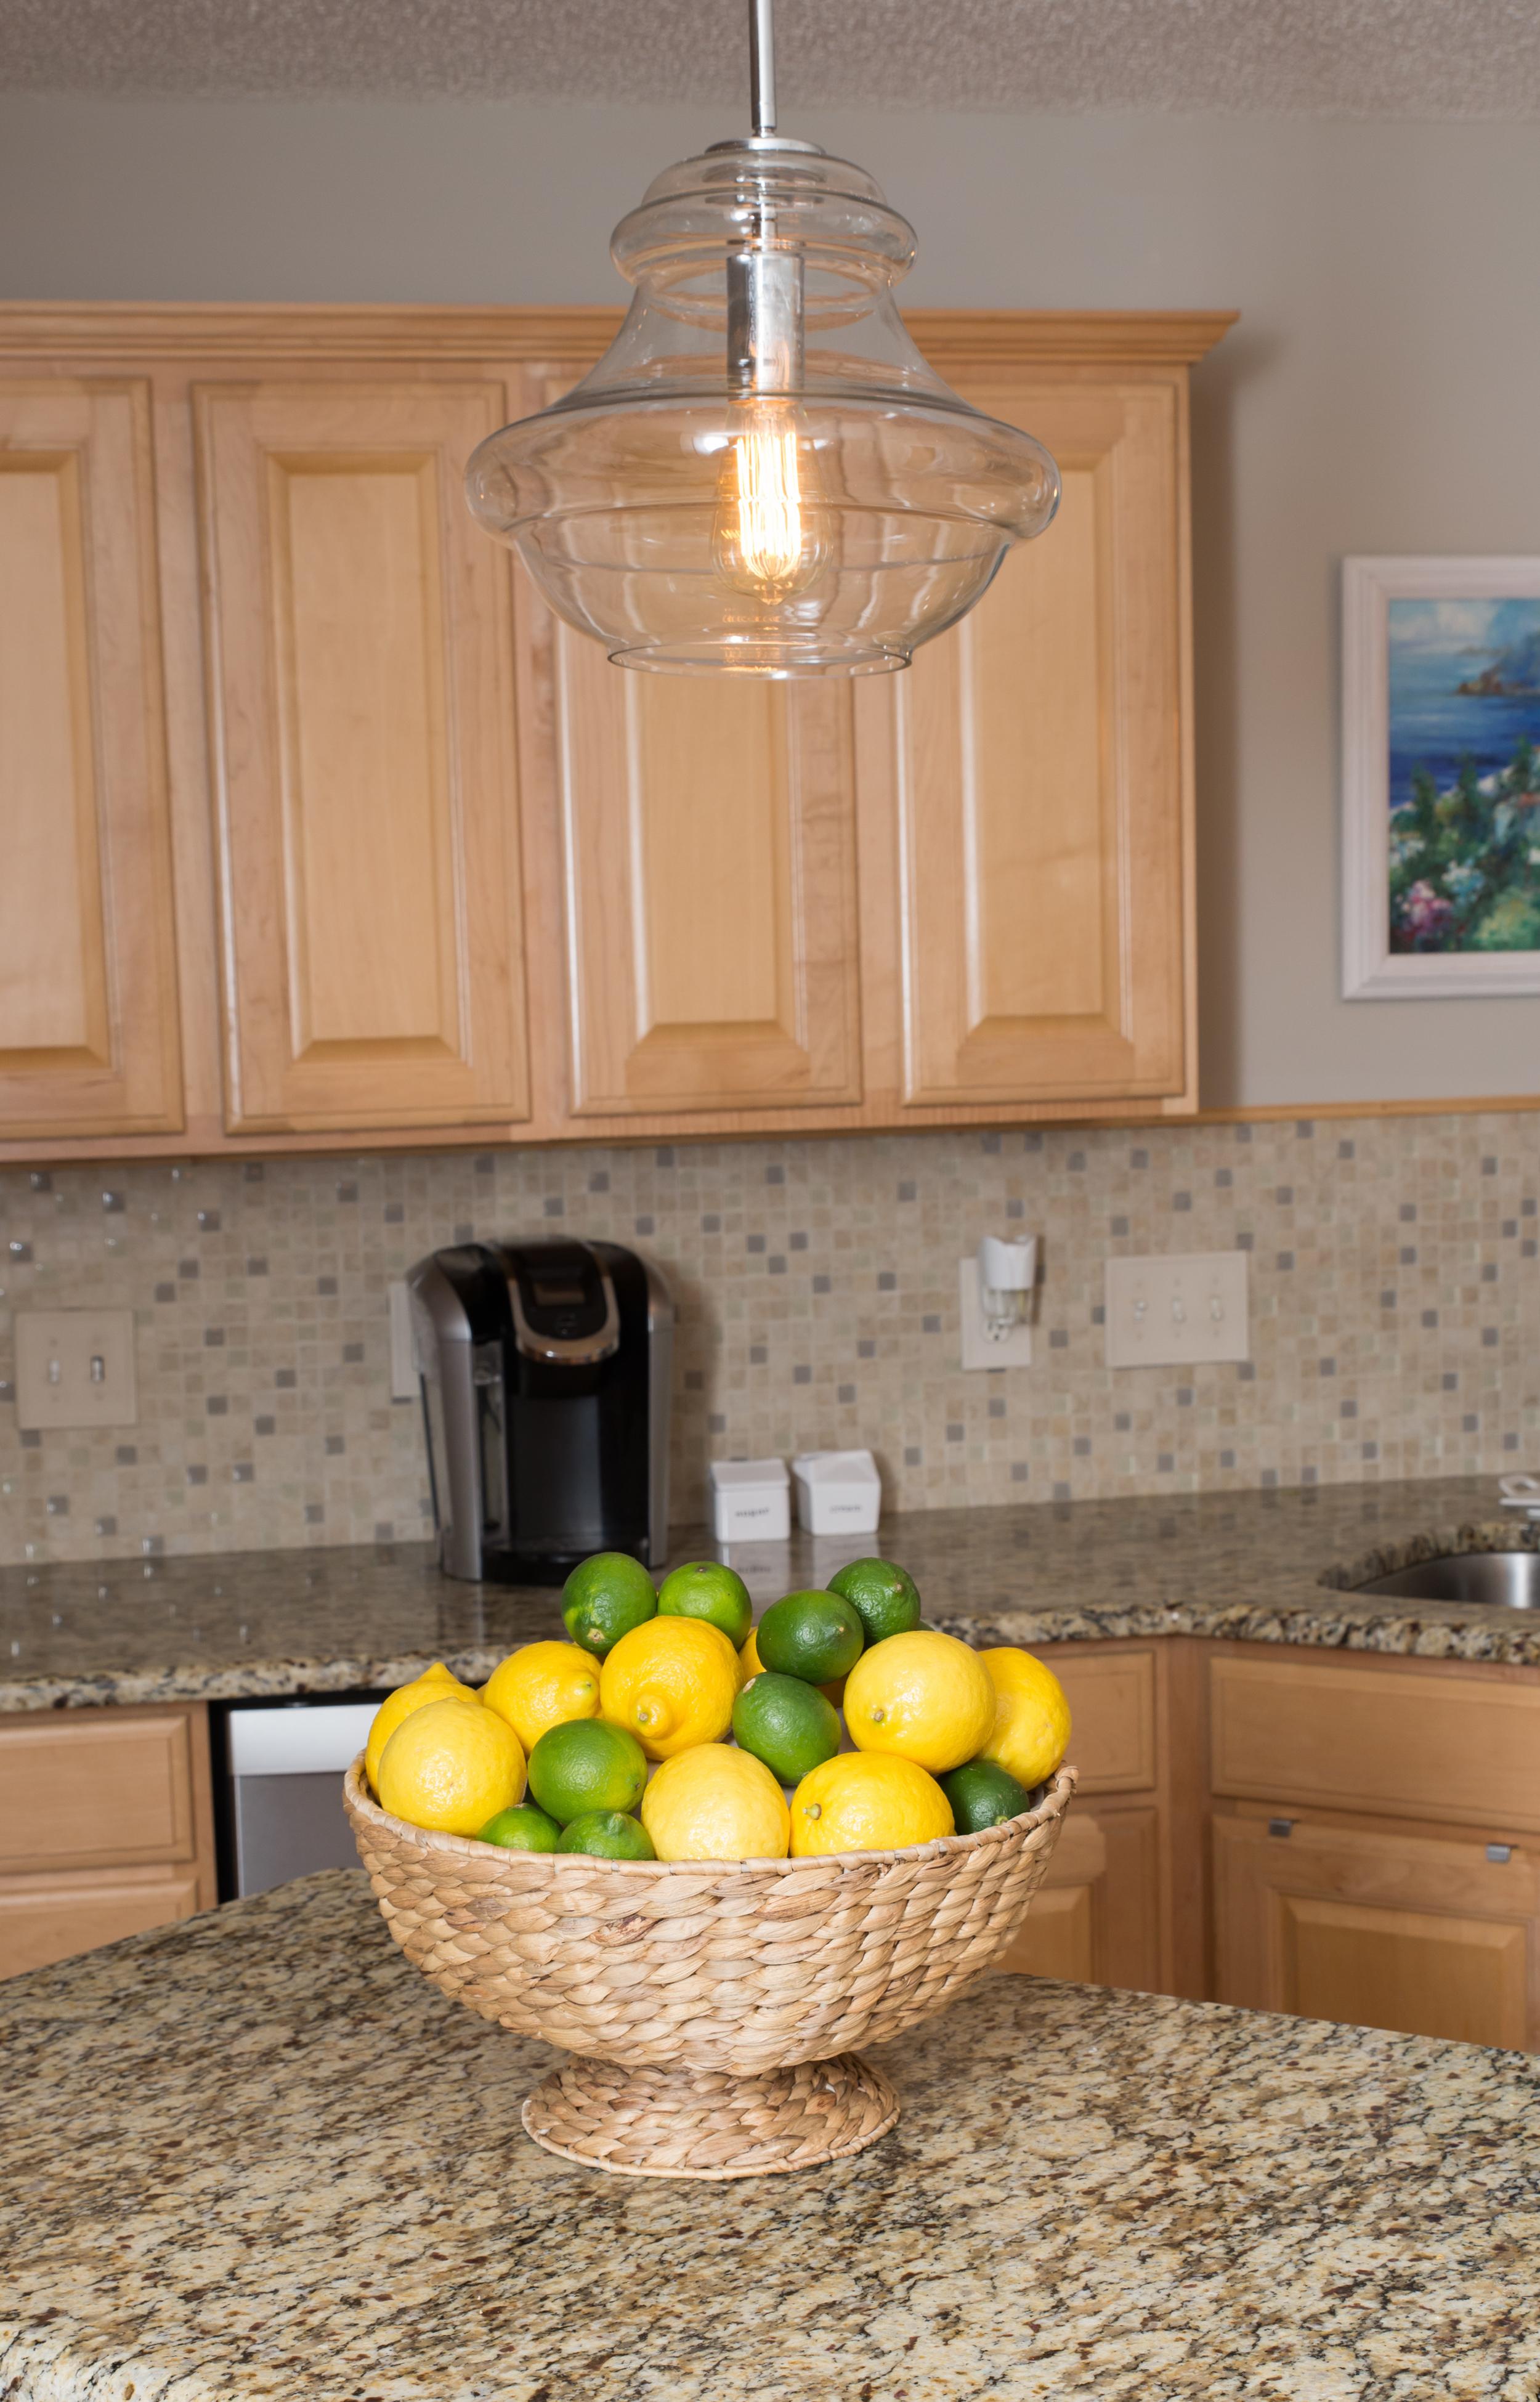 Artful Interiors Kitchen Fruit Bowl